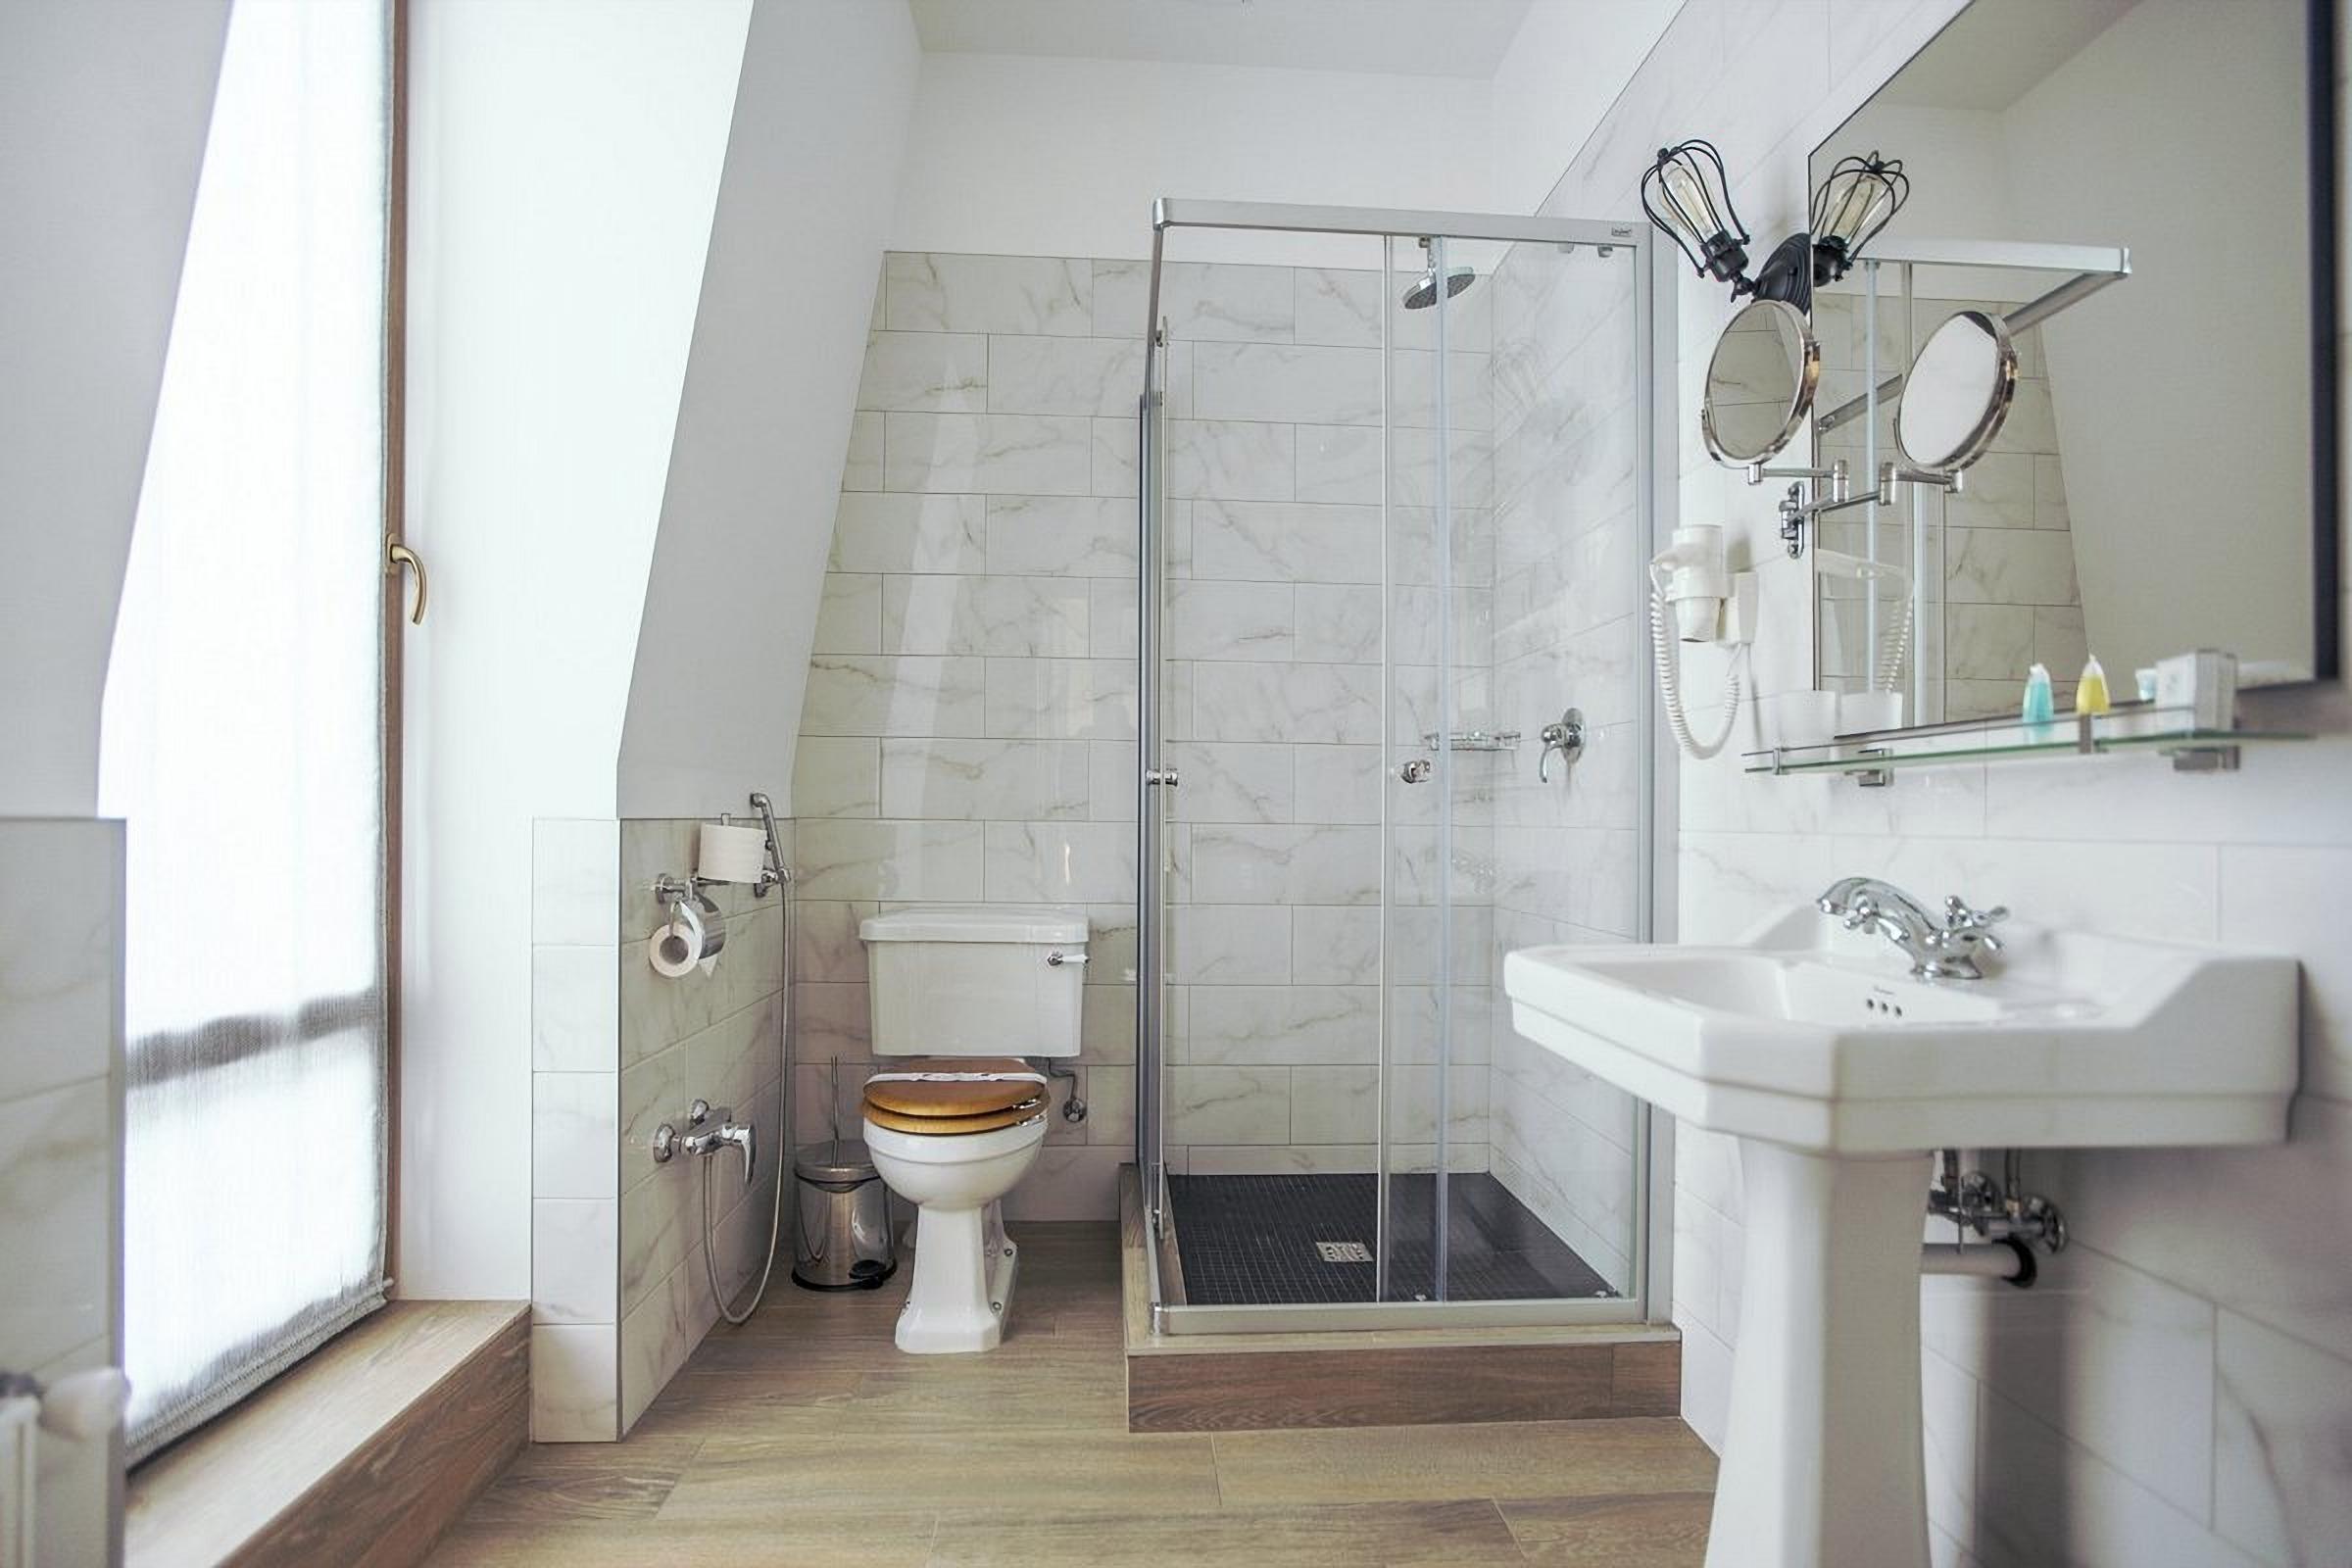 Room shower at Wall Street Hotel Odessa Ukraine